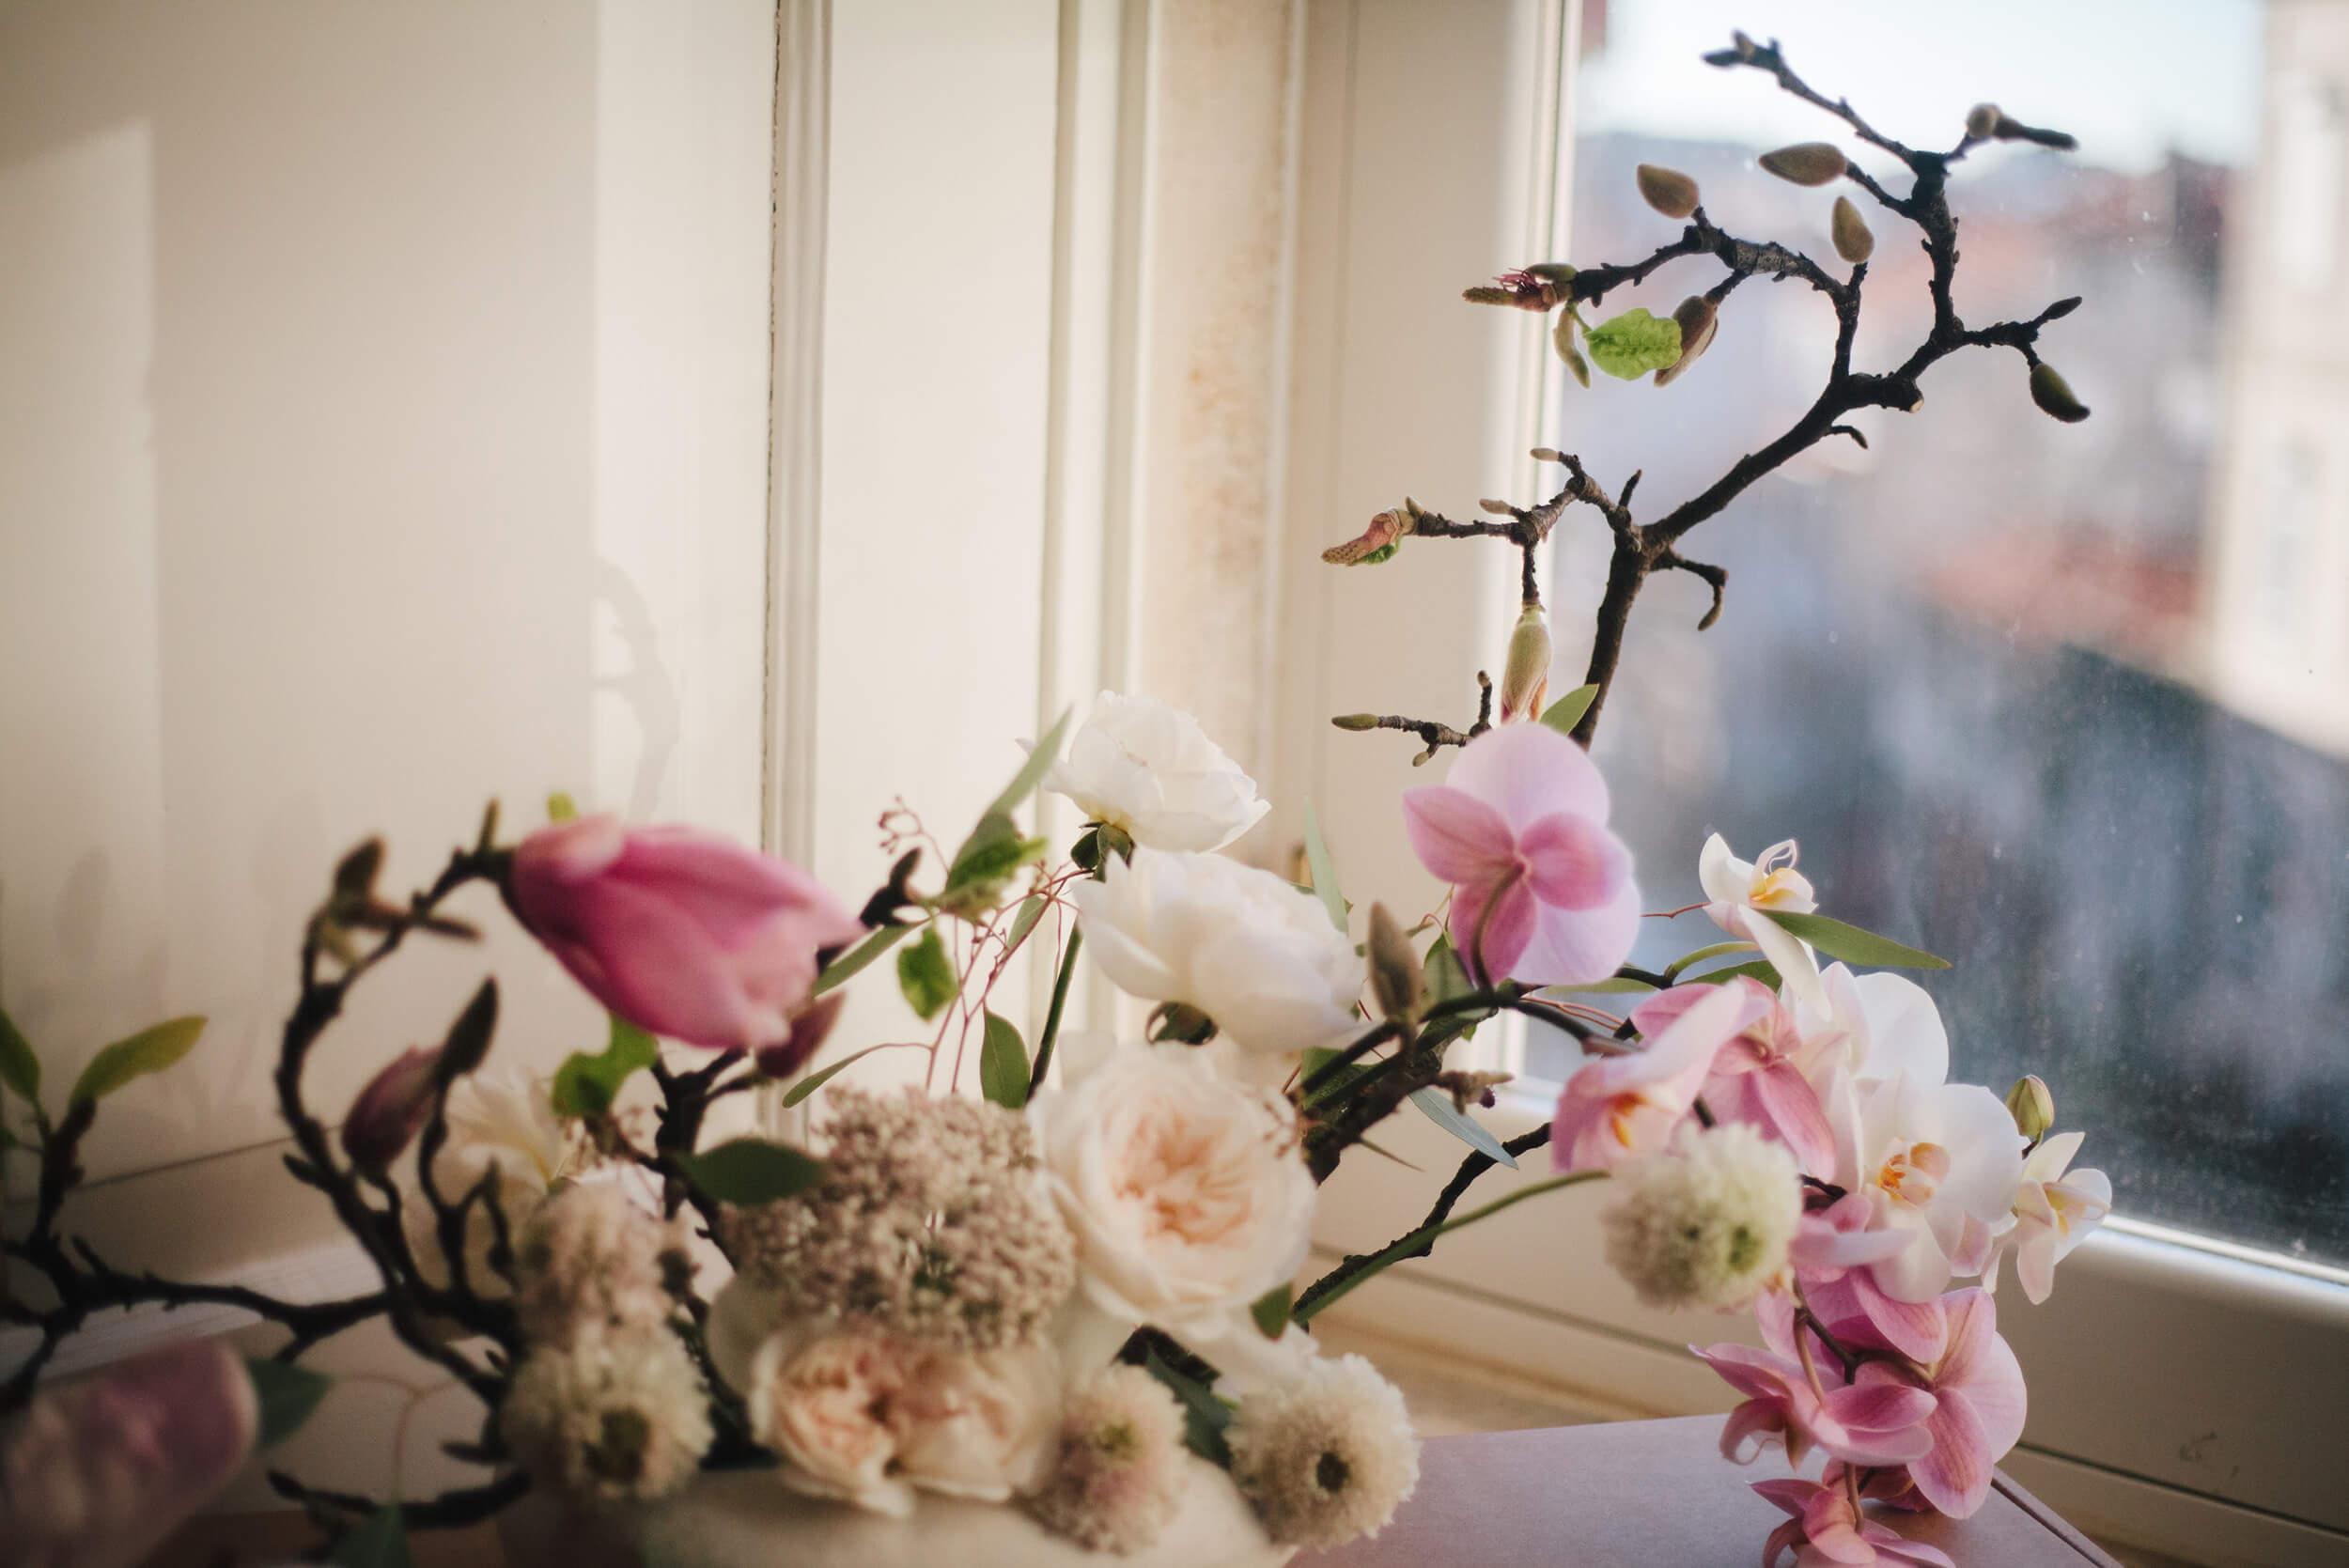 roma-organizacao-eventos-editorial-jardin-d'epoque-design-floral-30